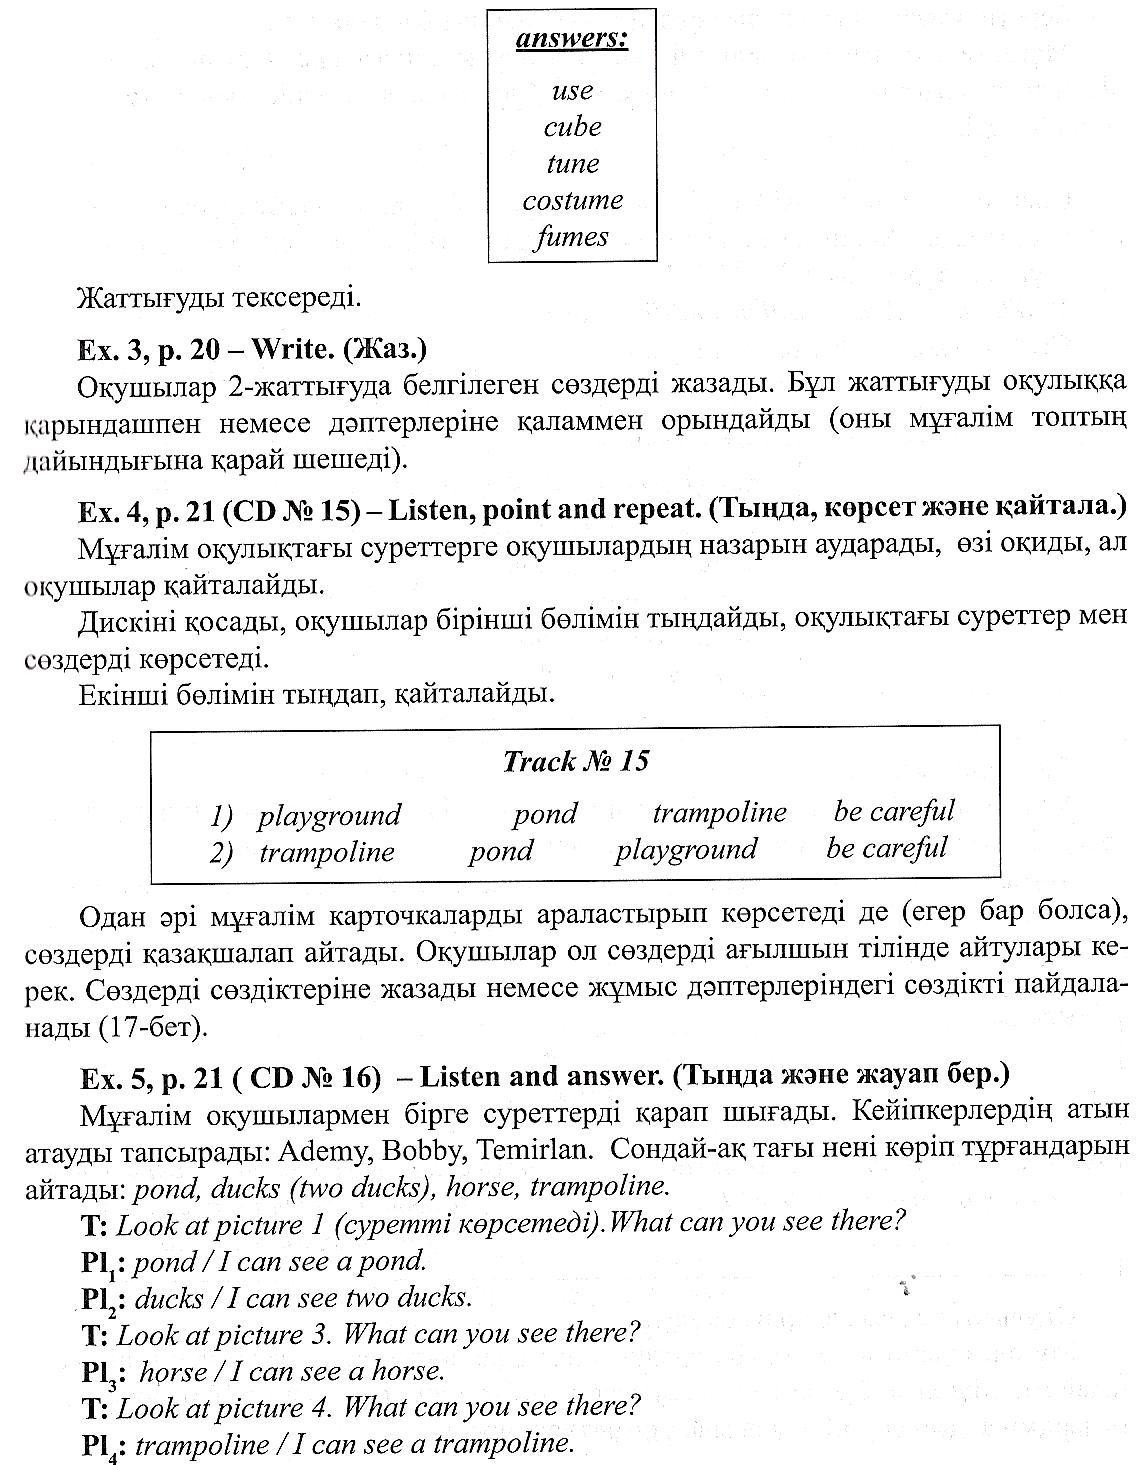 C:\Documents and Settings\User\Local Settings\Temporary Internet Files\Content.Word\сканирование0008.jpg